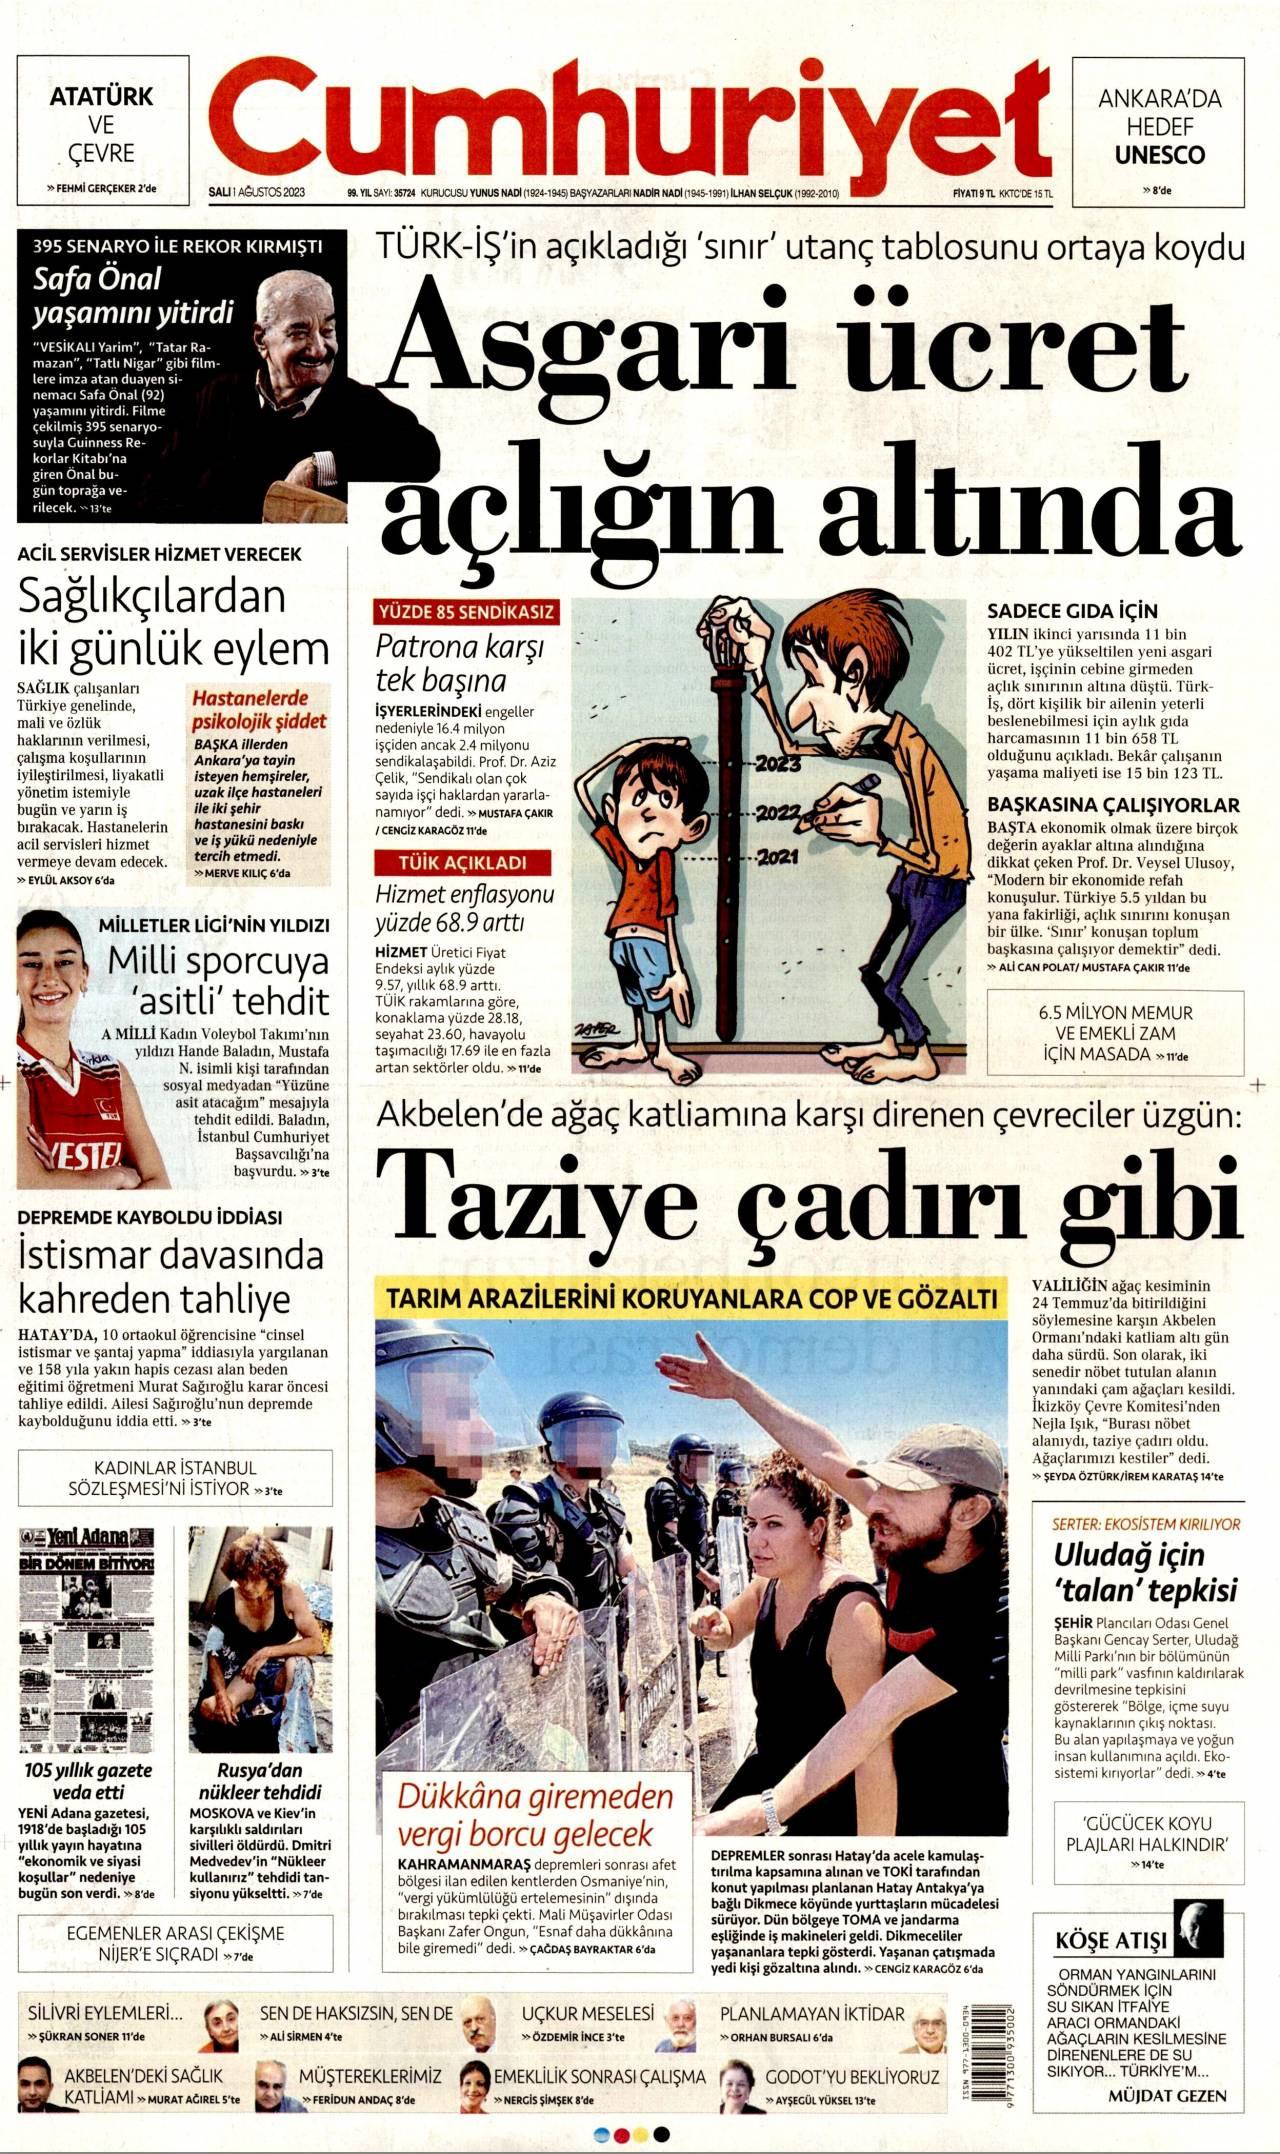 1 Haziran 2020, Pazartesi cumhuriyet Gazetesi